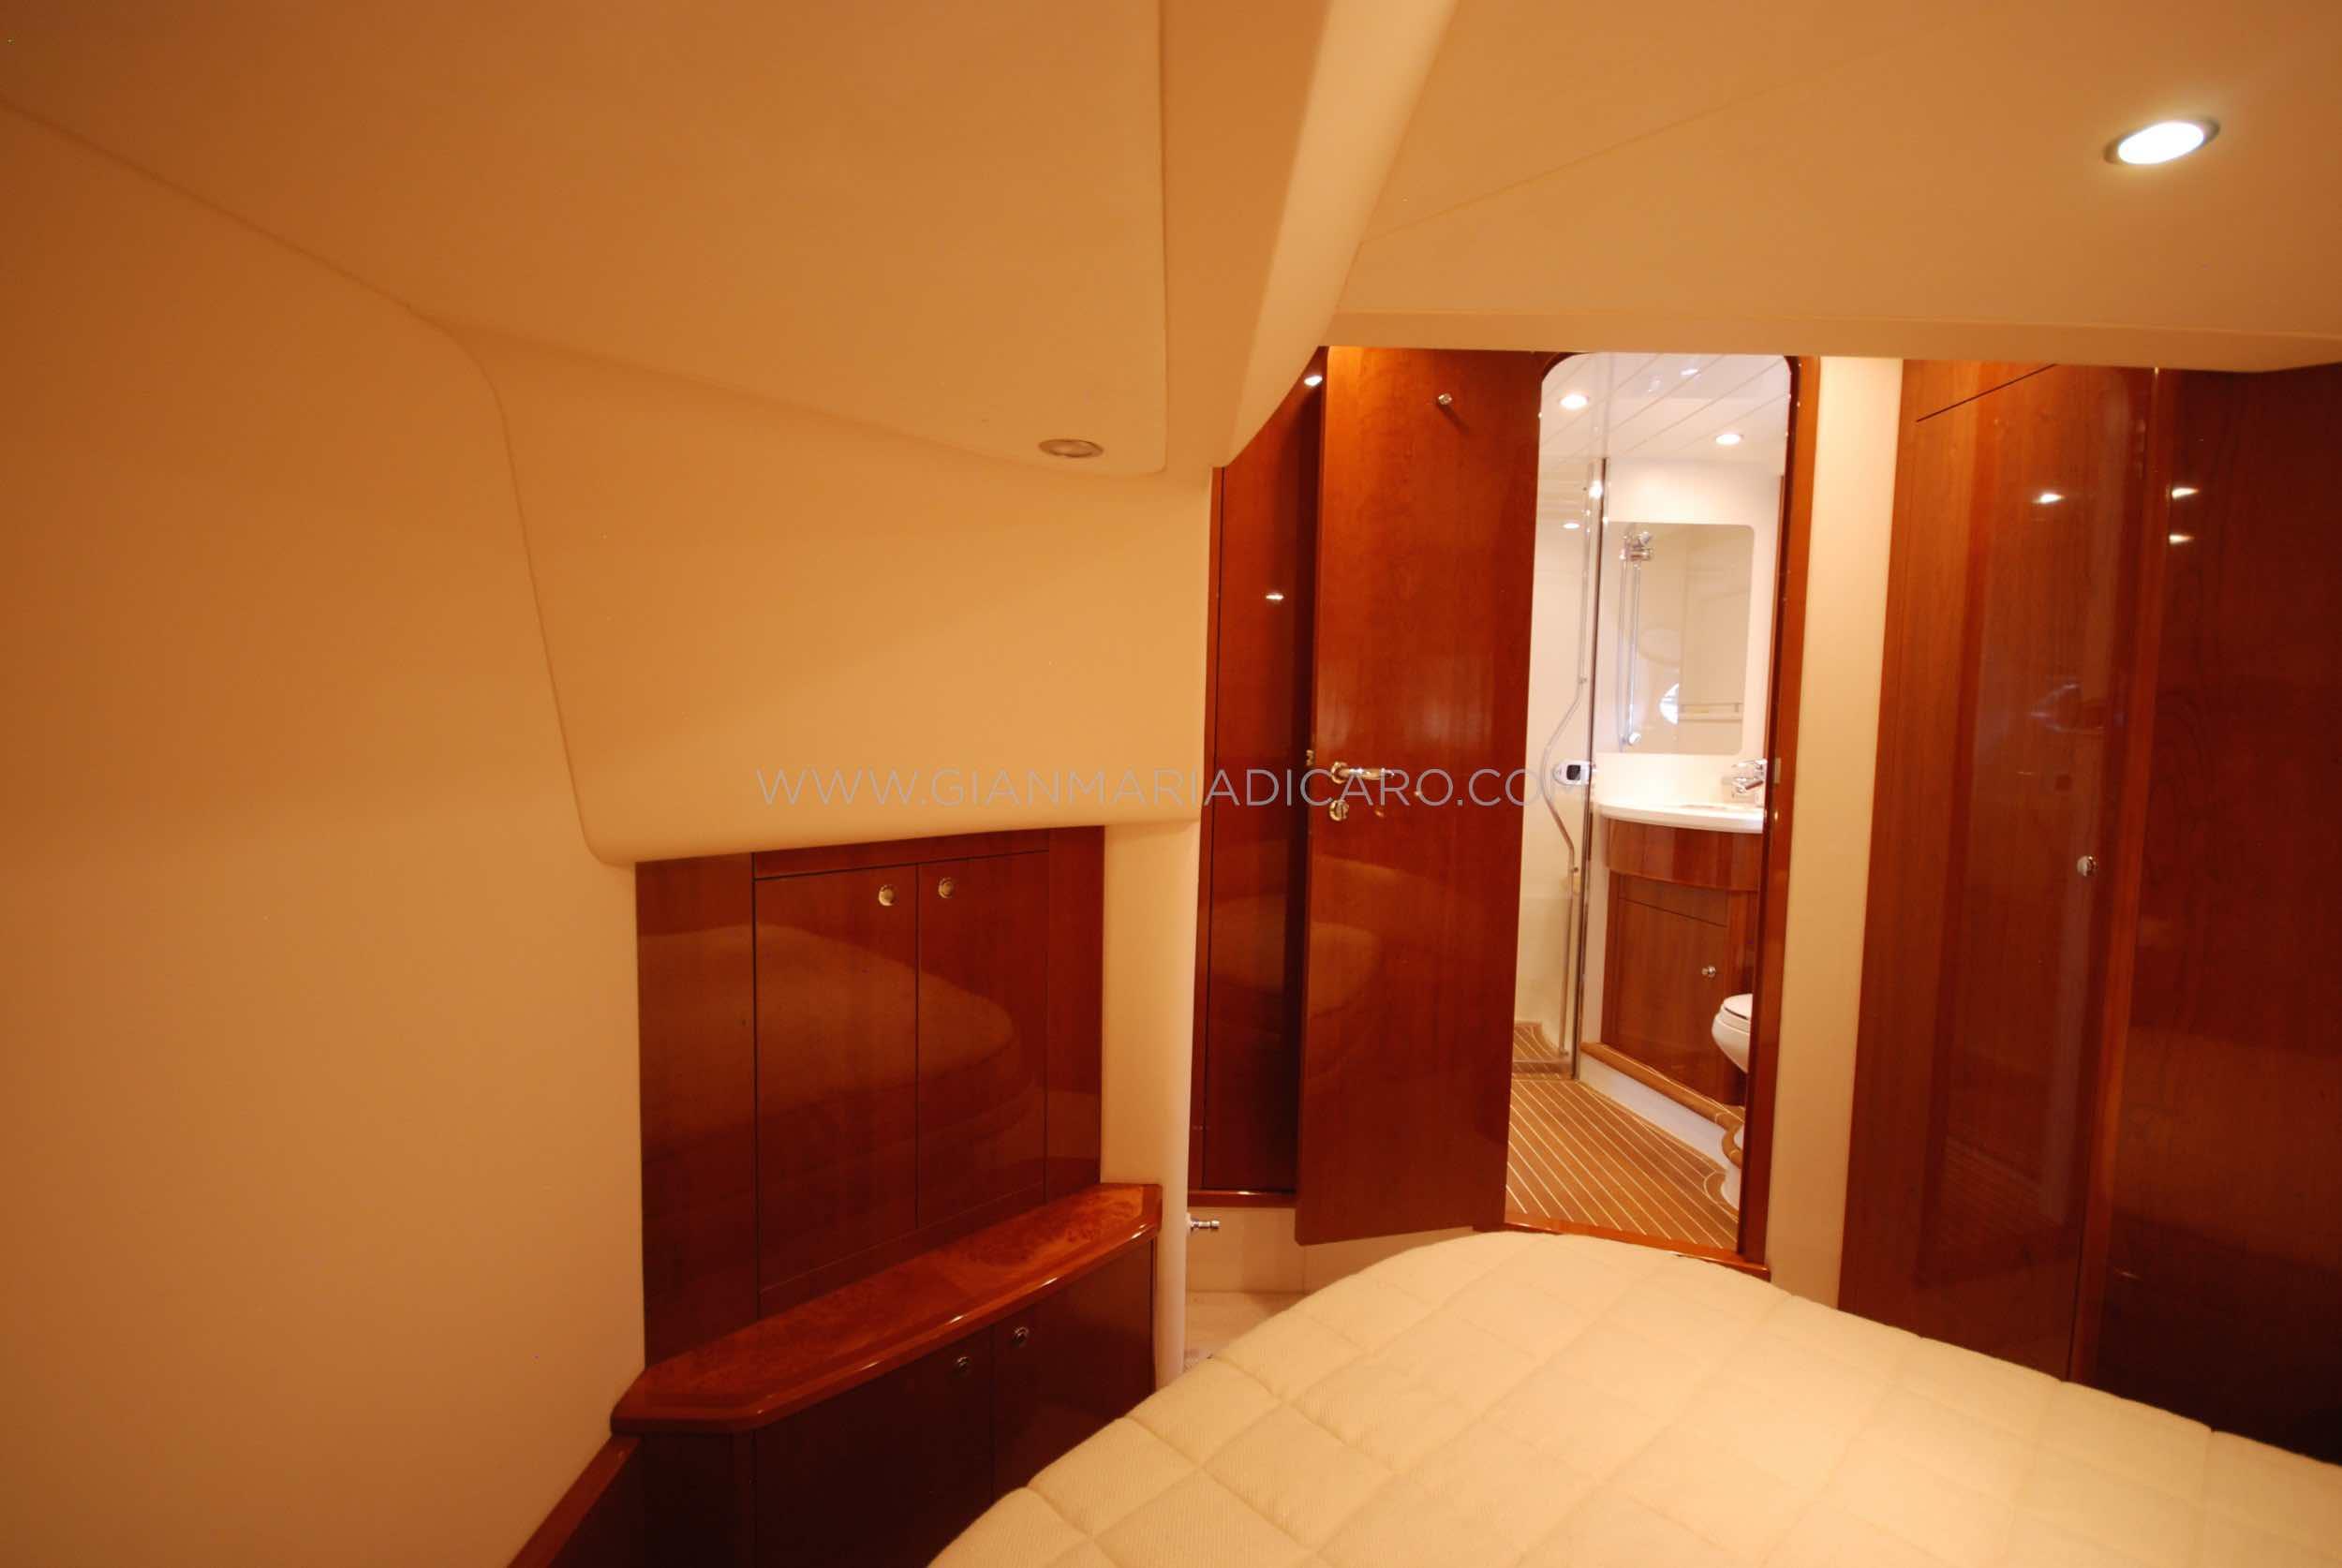 princess-yachts-v58-maestro-di-vita-for-sale-19.jpg